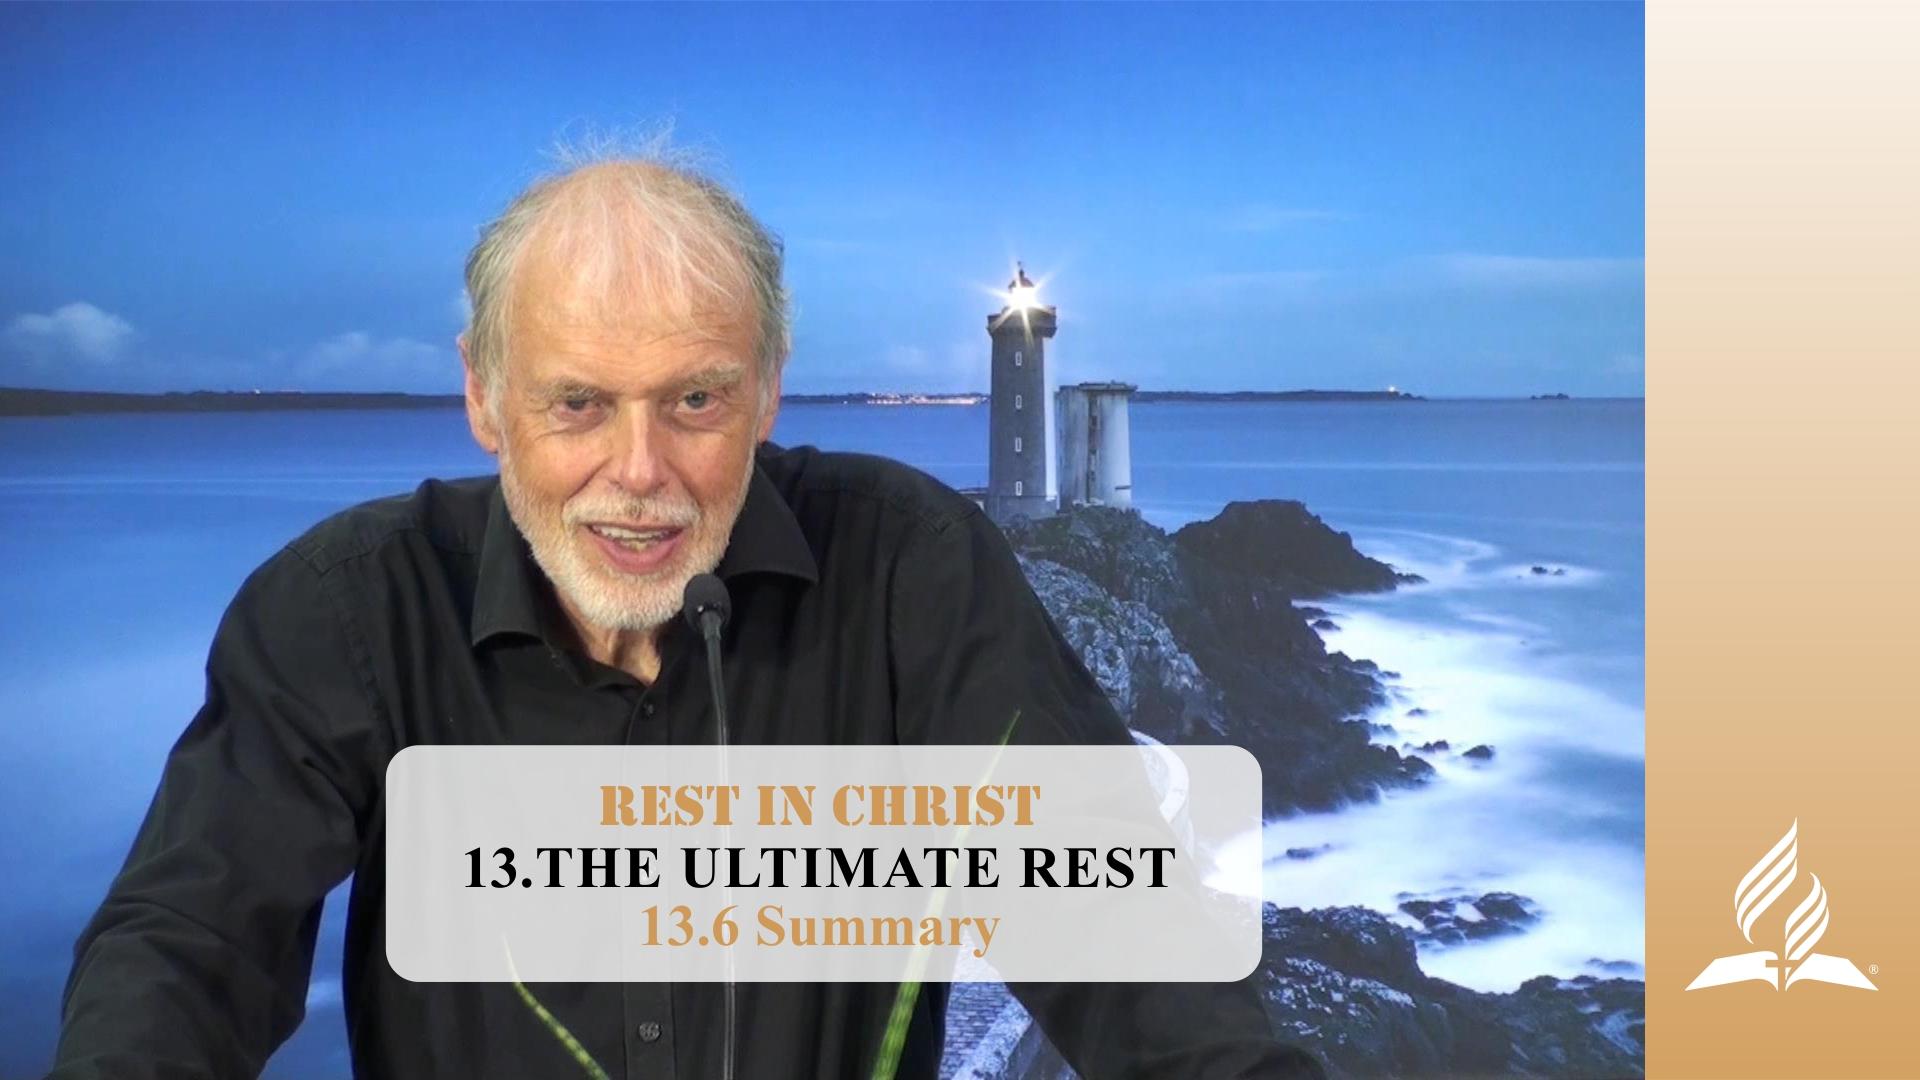 13.6 Summary – THE ULTIMATE REST | Pastor Kurt Piesslinger, M.A.